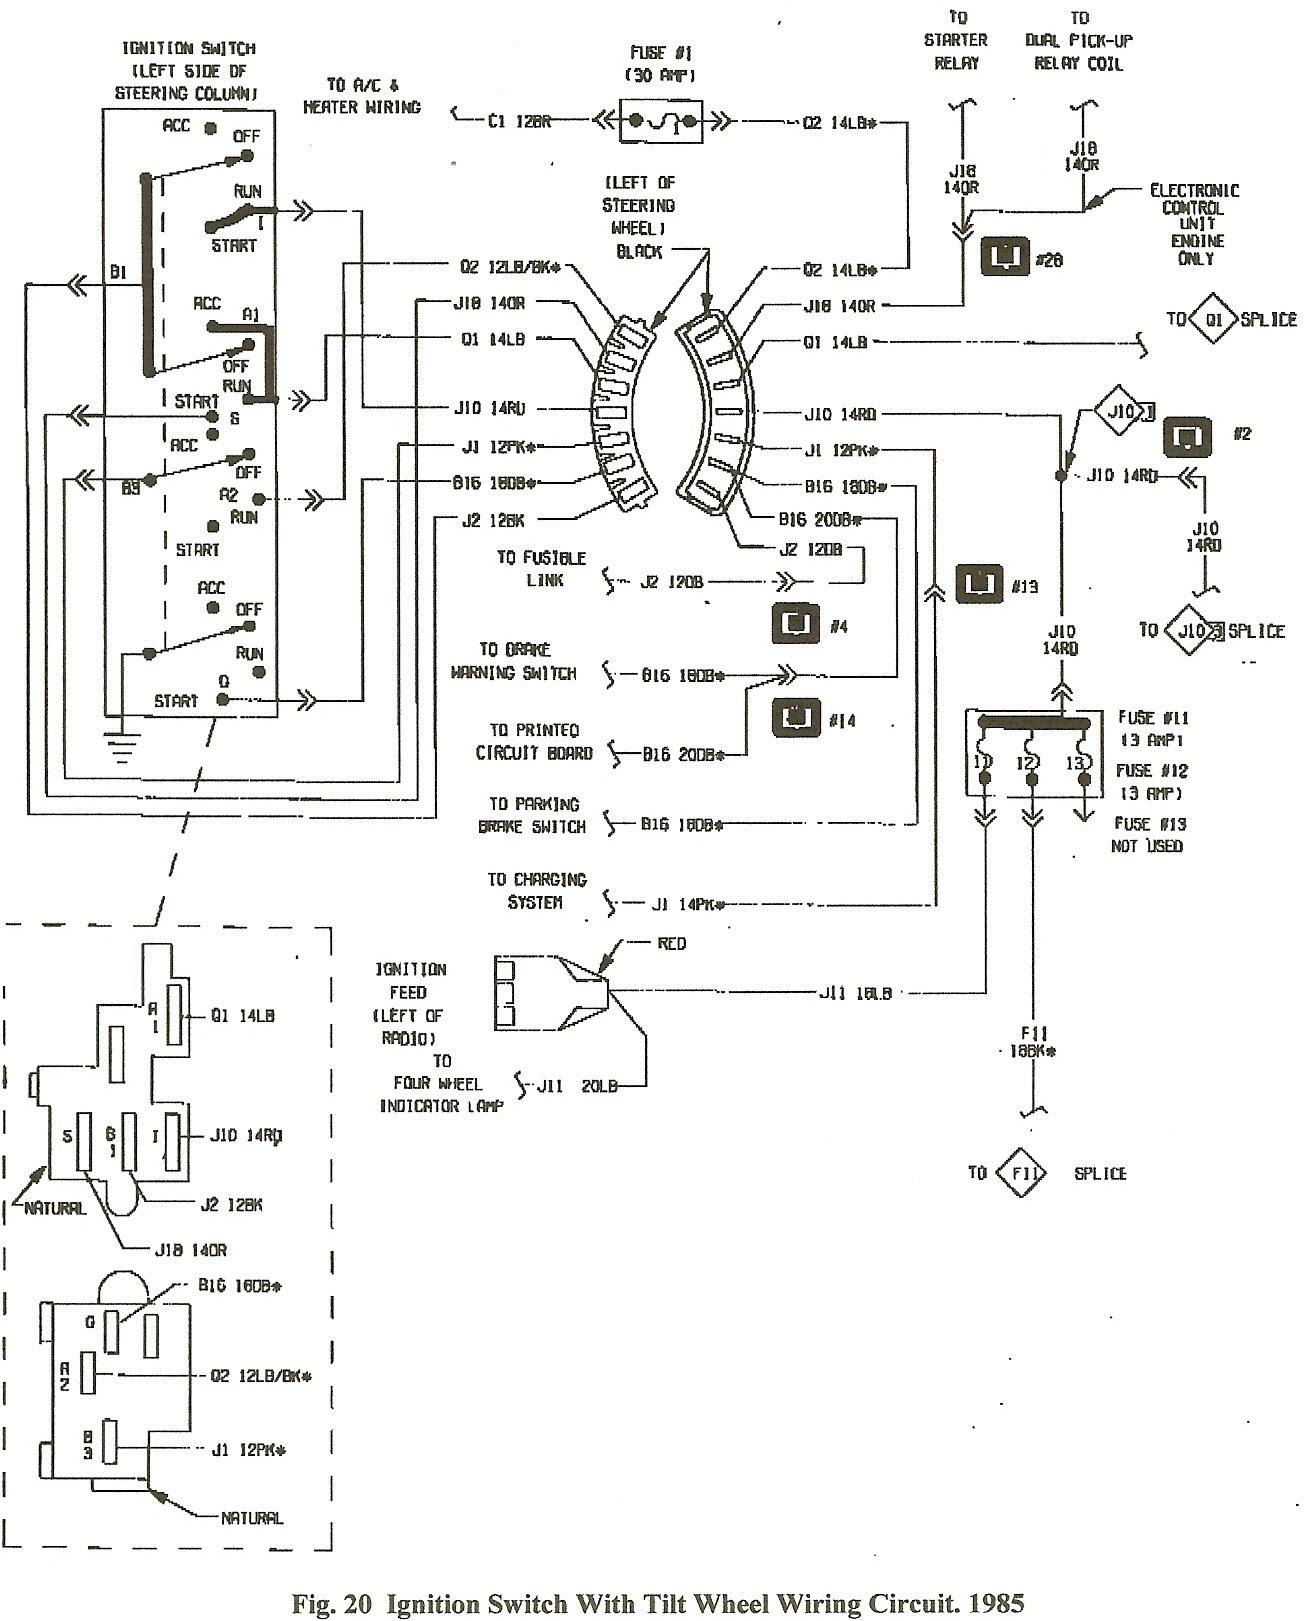 1985 Dodge Truck Wiring Diagram 2006 Ford F 150 Wire Harness Begeboy Wiring Diagram Source